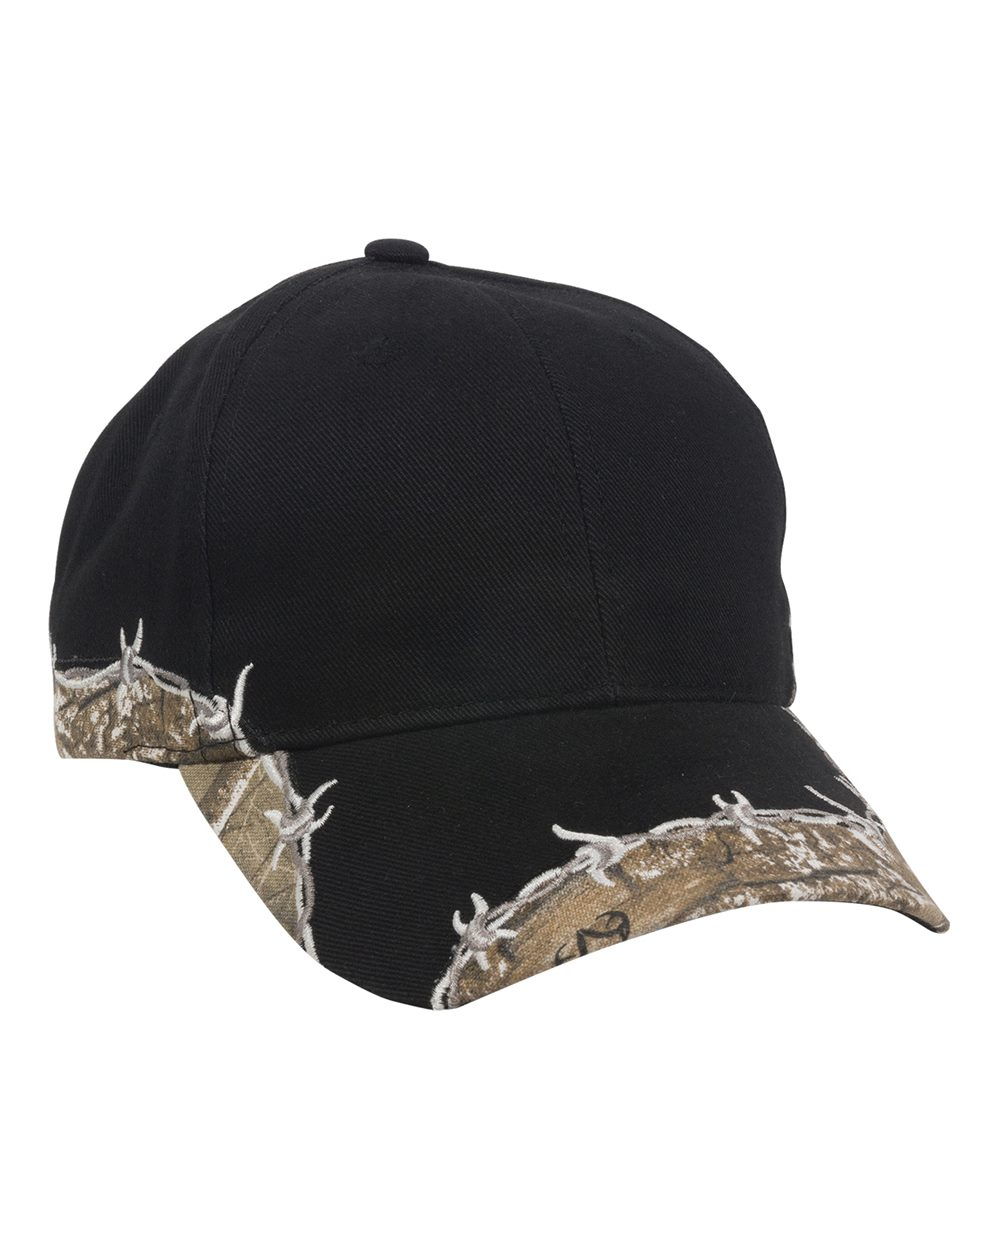 Outdoor Cap BRB605-Barbed Wire Camo Cap